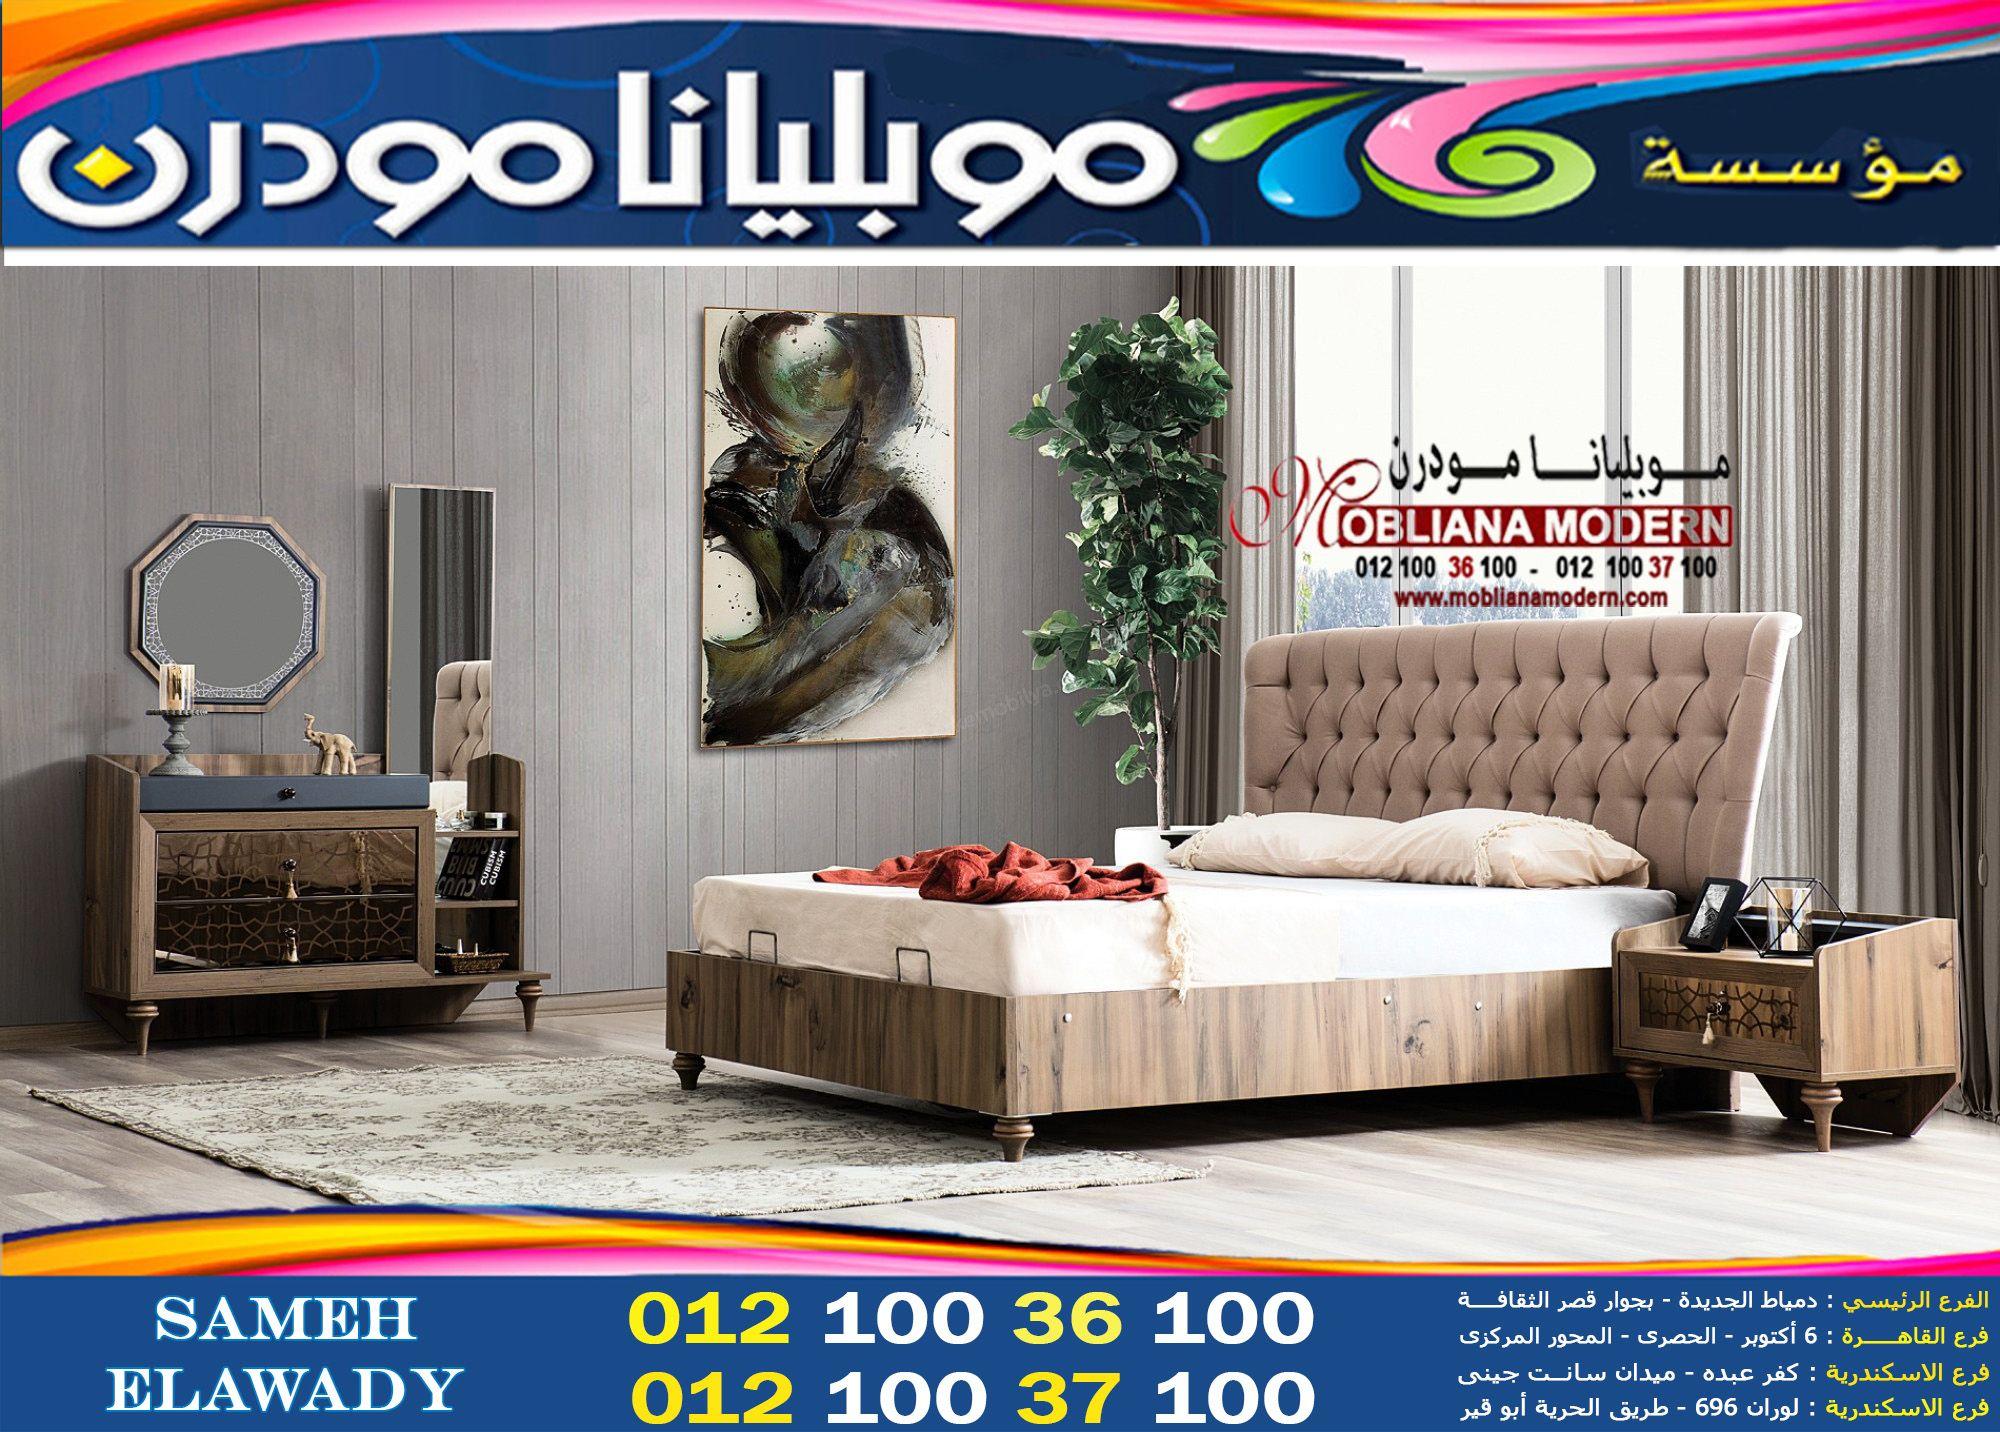 اثاث 2023 دمياط غرف 2024 مودرن دمياط In 2021 Home Decor Furniture Bedroom